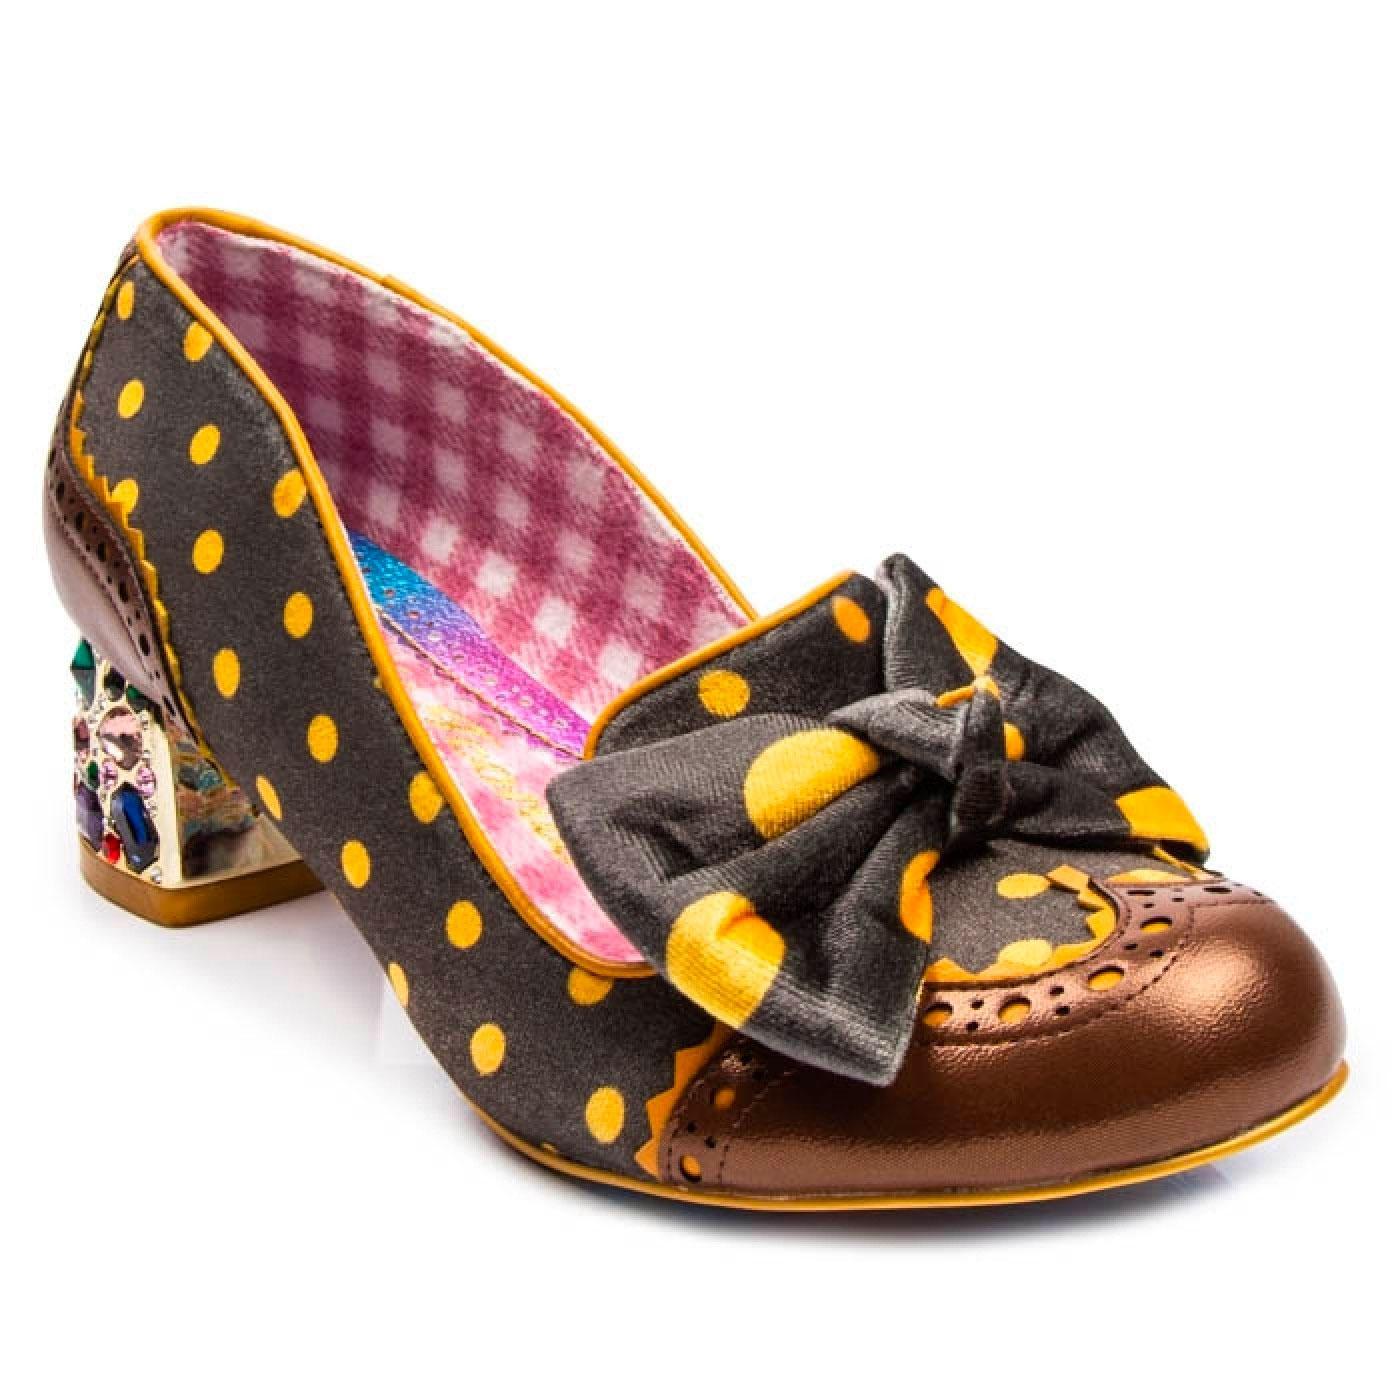 Potluck IRREGULAR CHOICE Polka Dot Retro Shoes